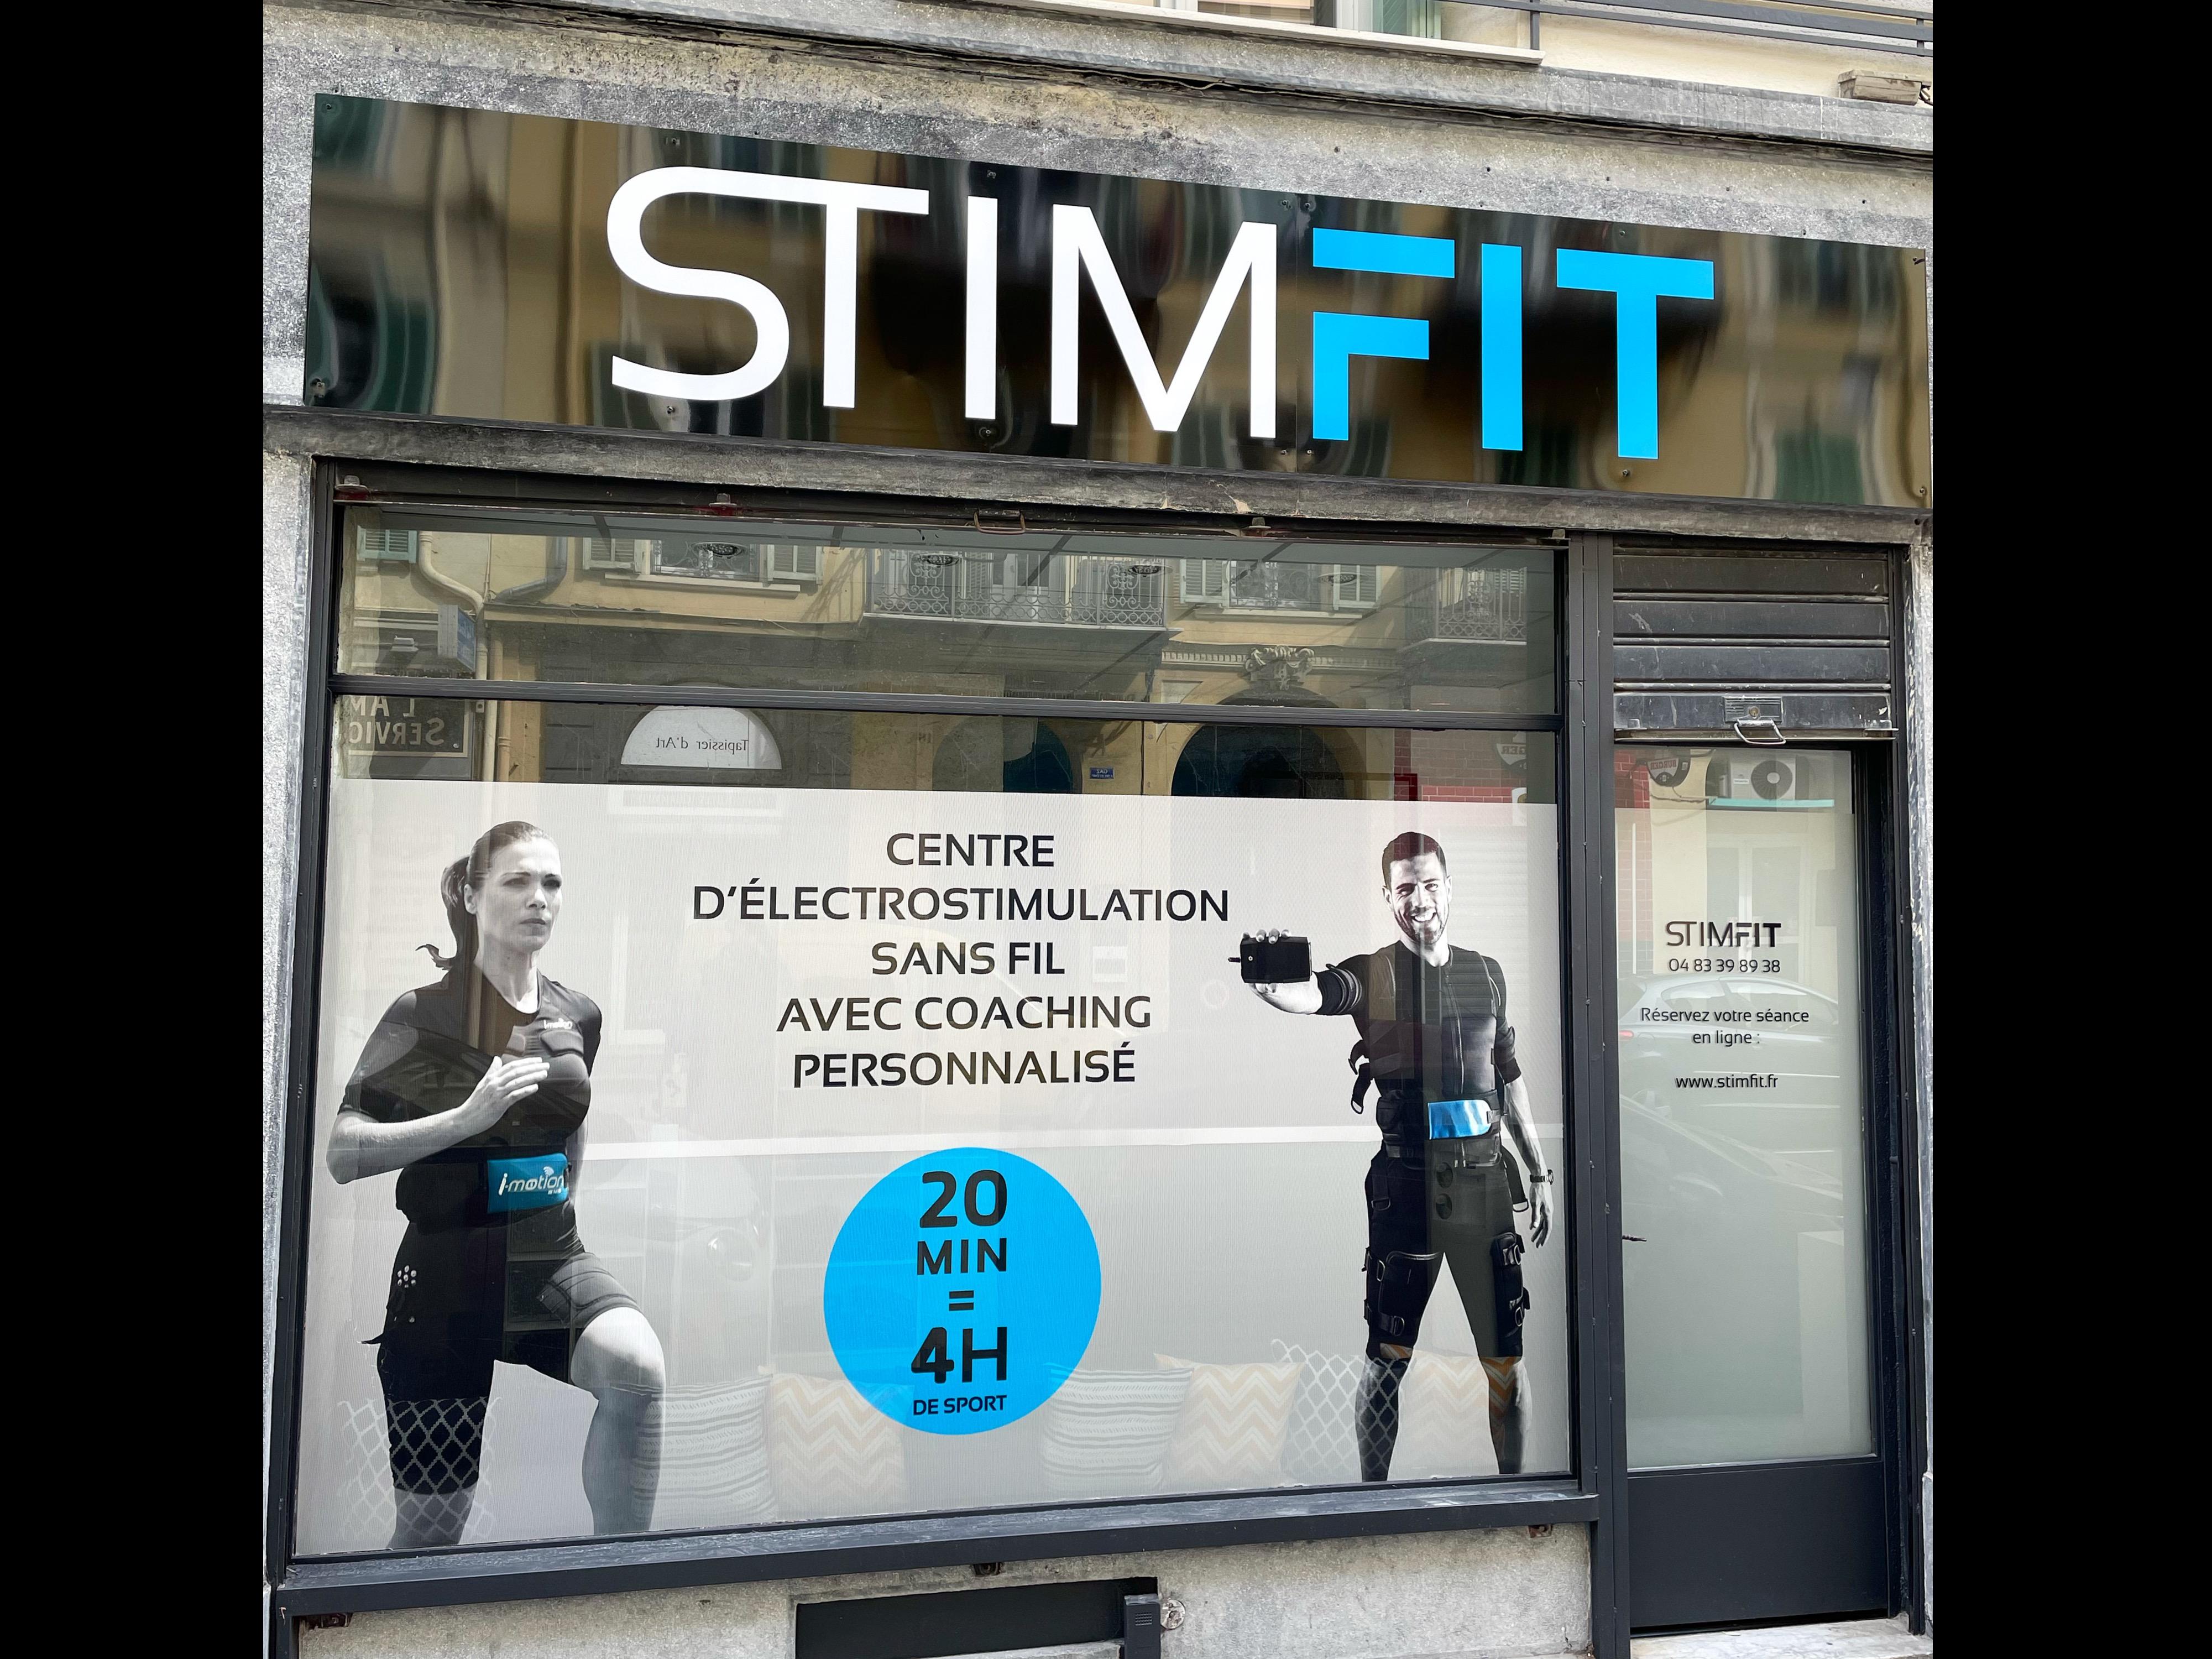 Stimfit Nice